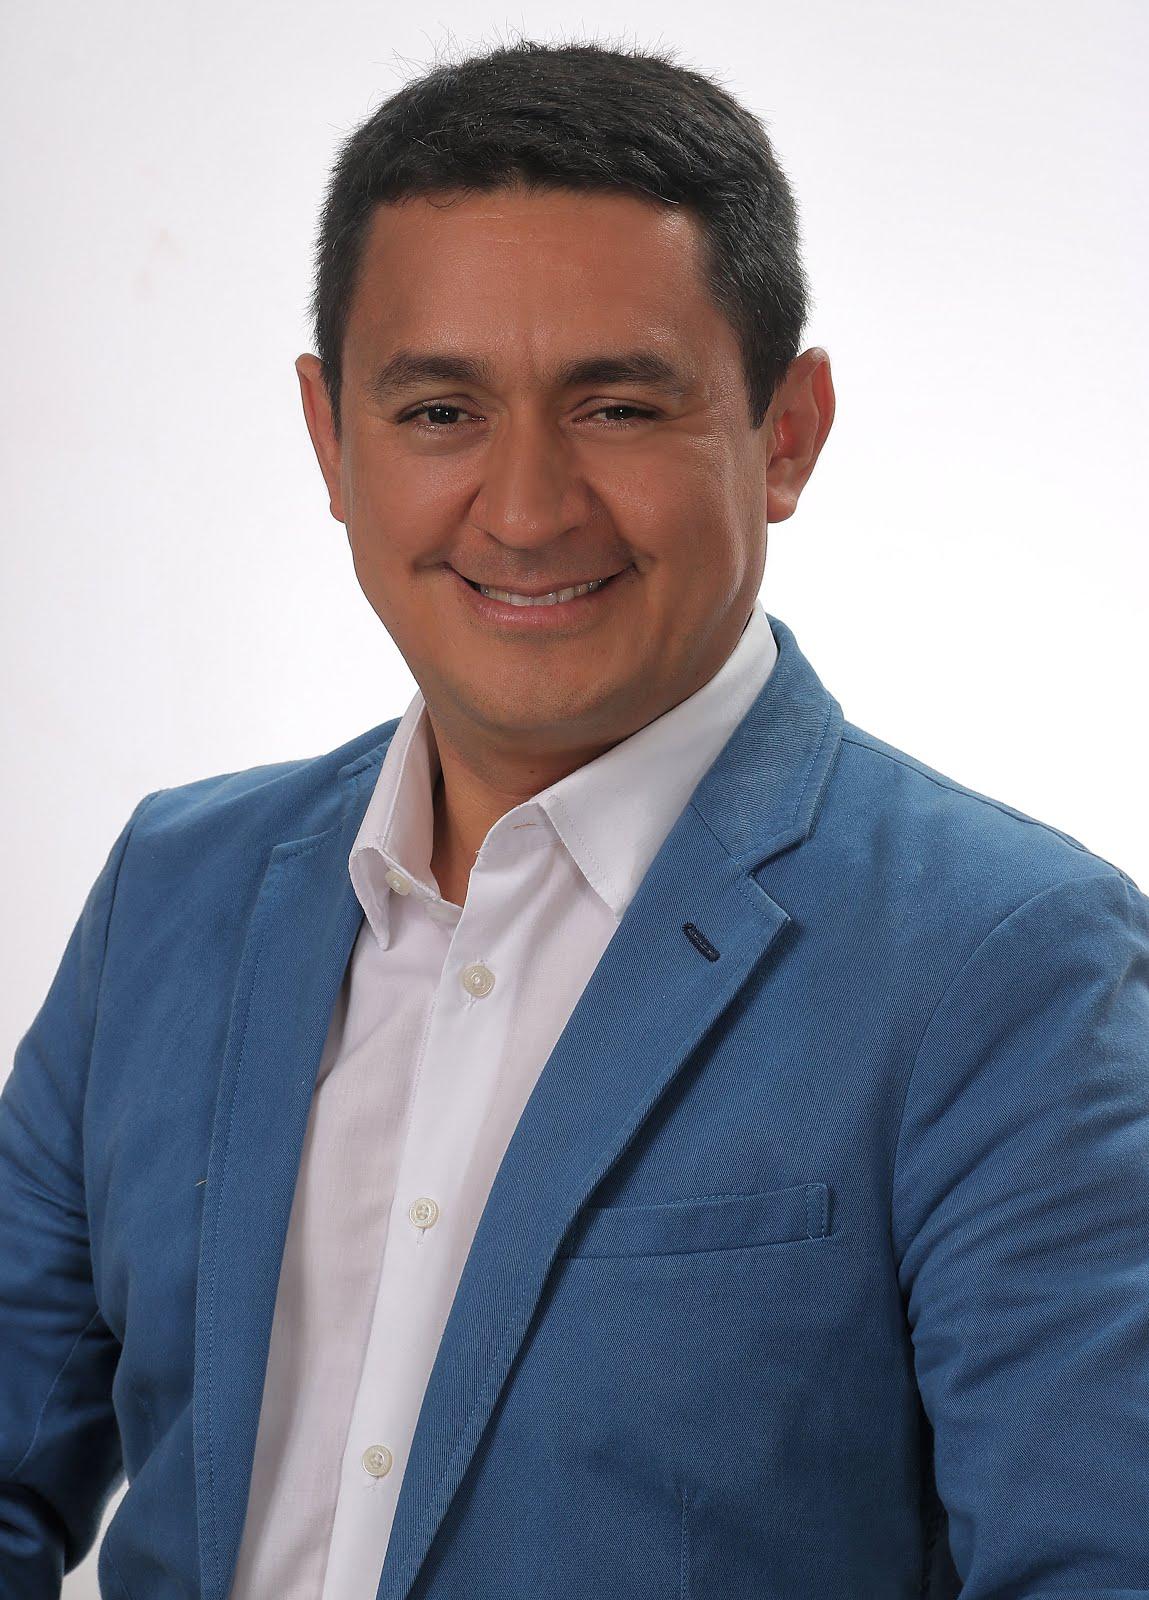 Henry Adolfo Peralta Buritíca